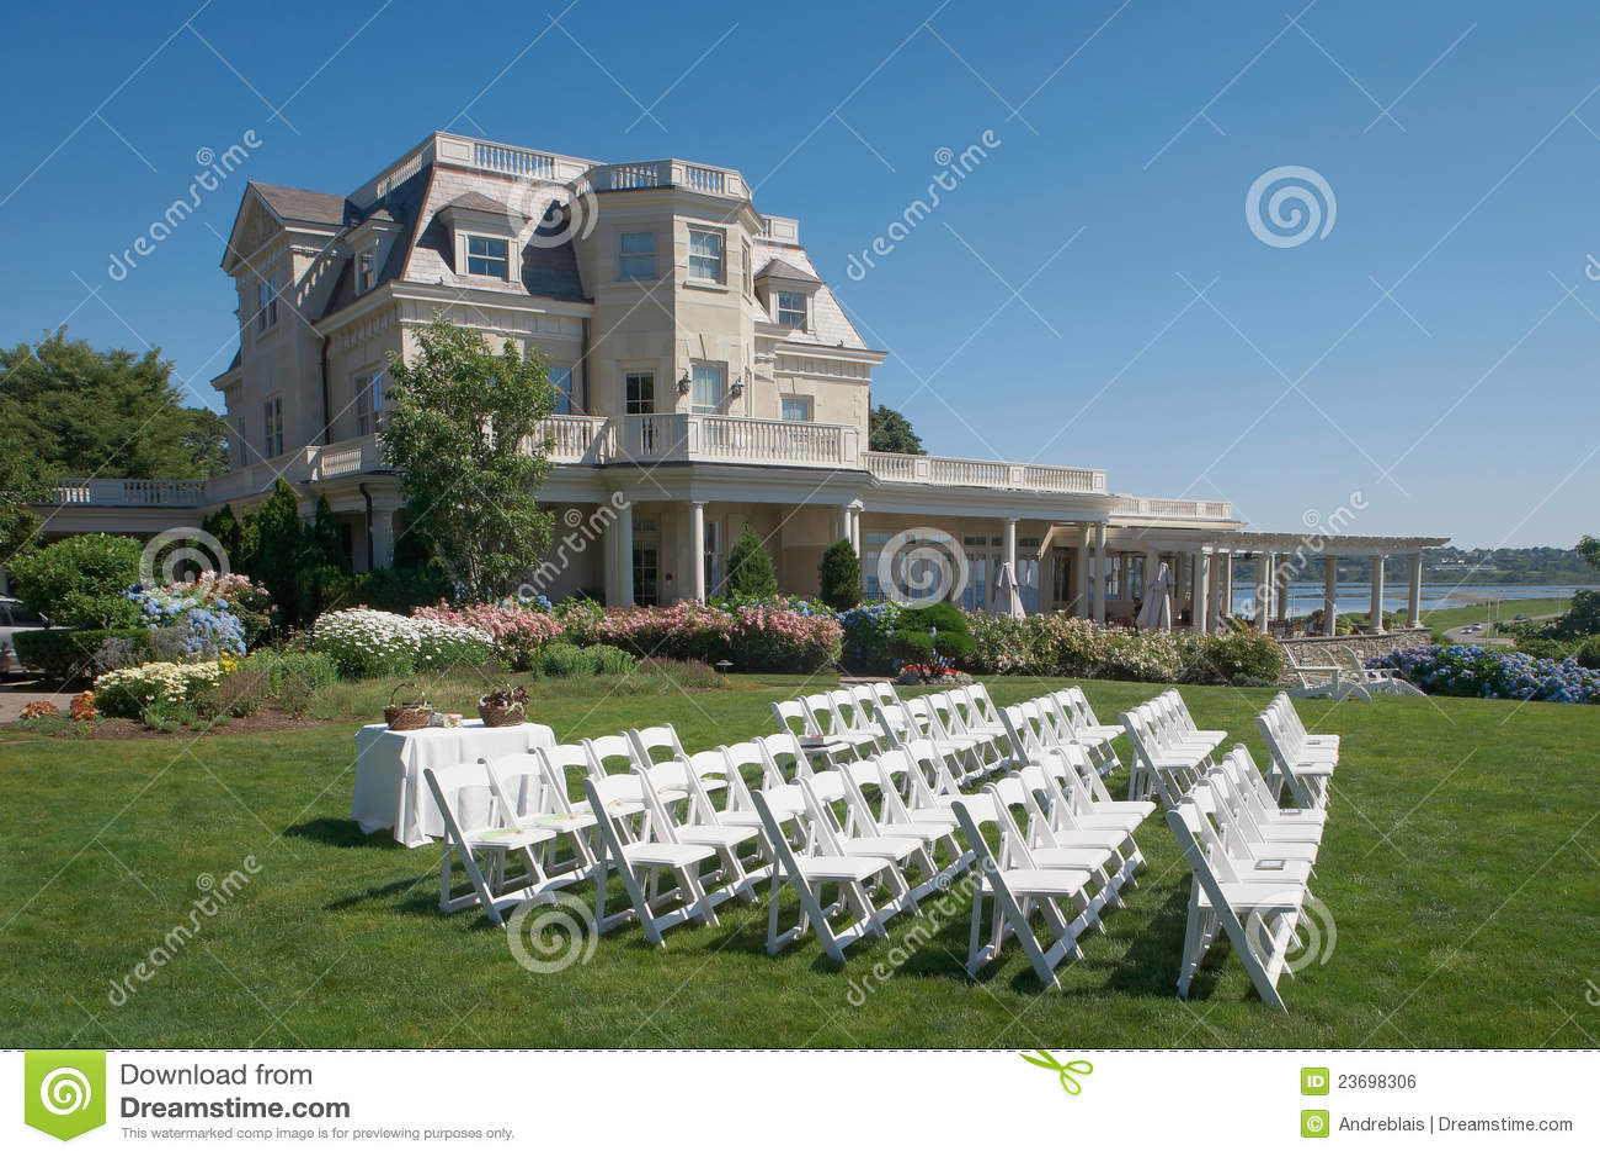 Wedding Ceremony Site Royalty Free Stock Image